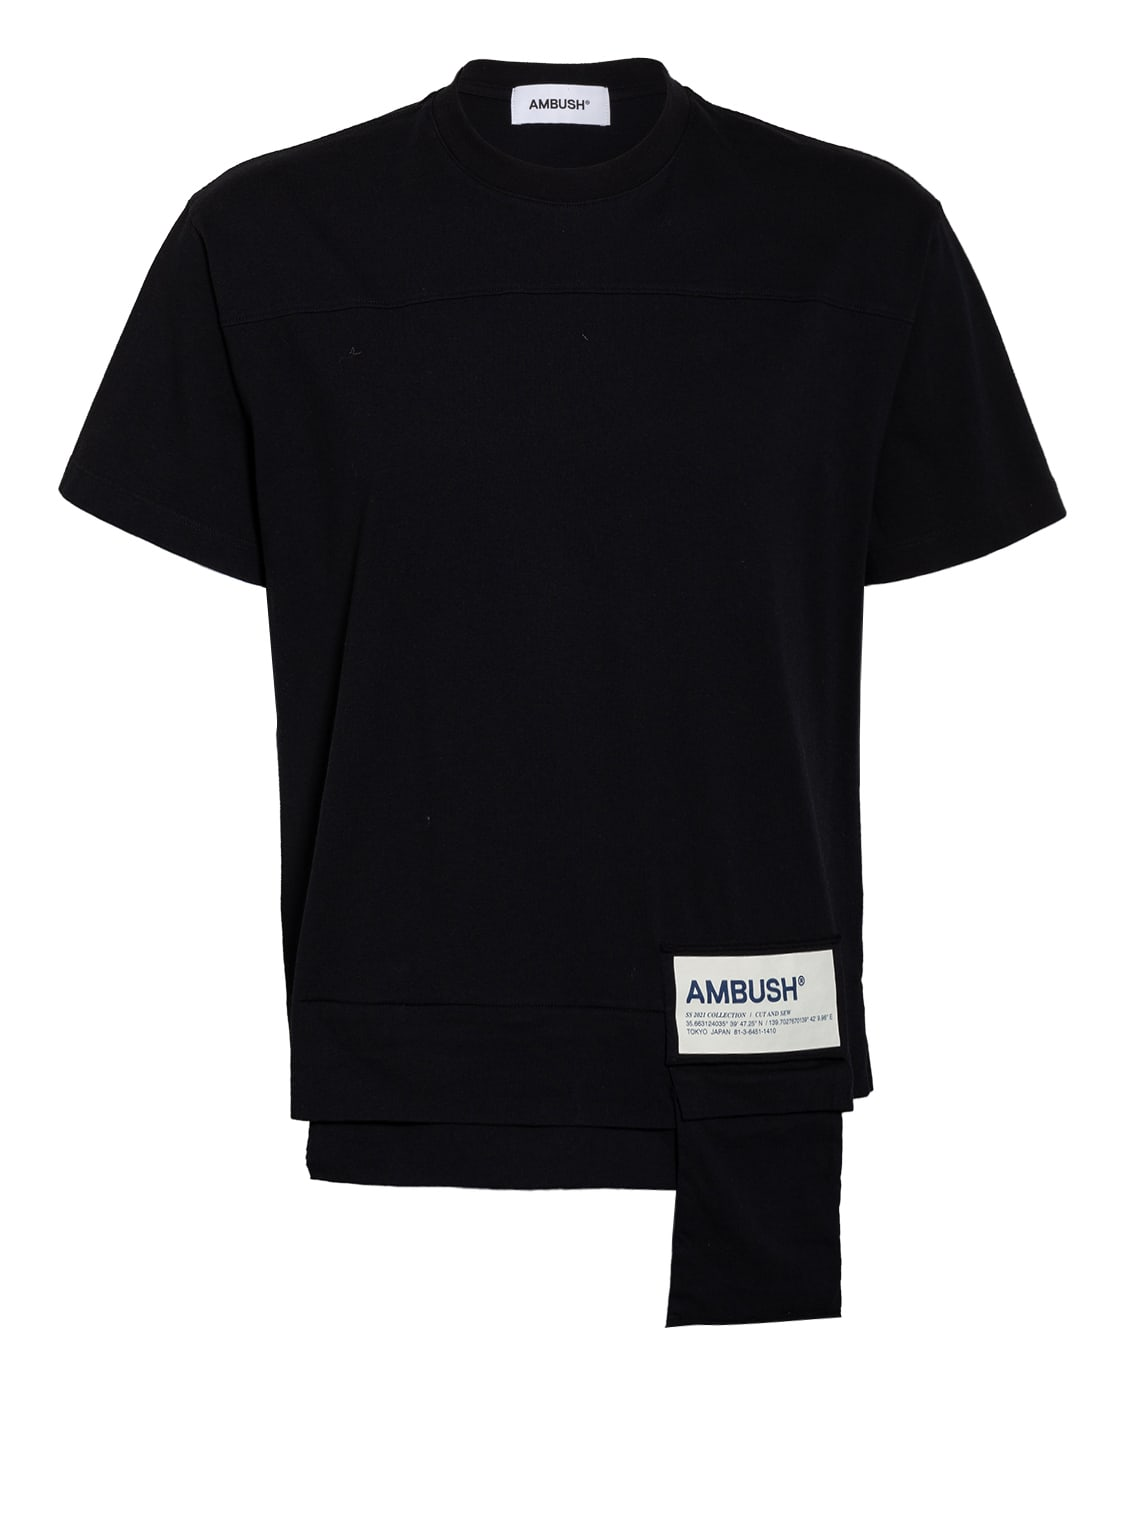 Image of Ambush T-Shirt schwarz